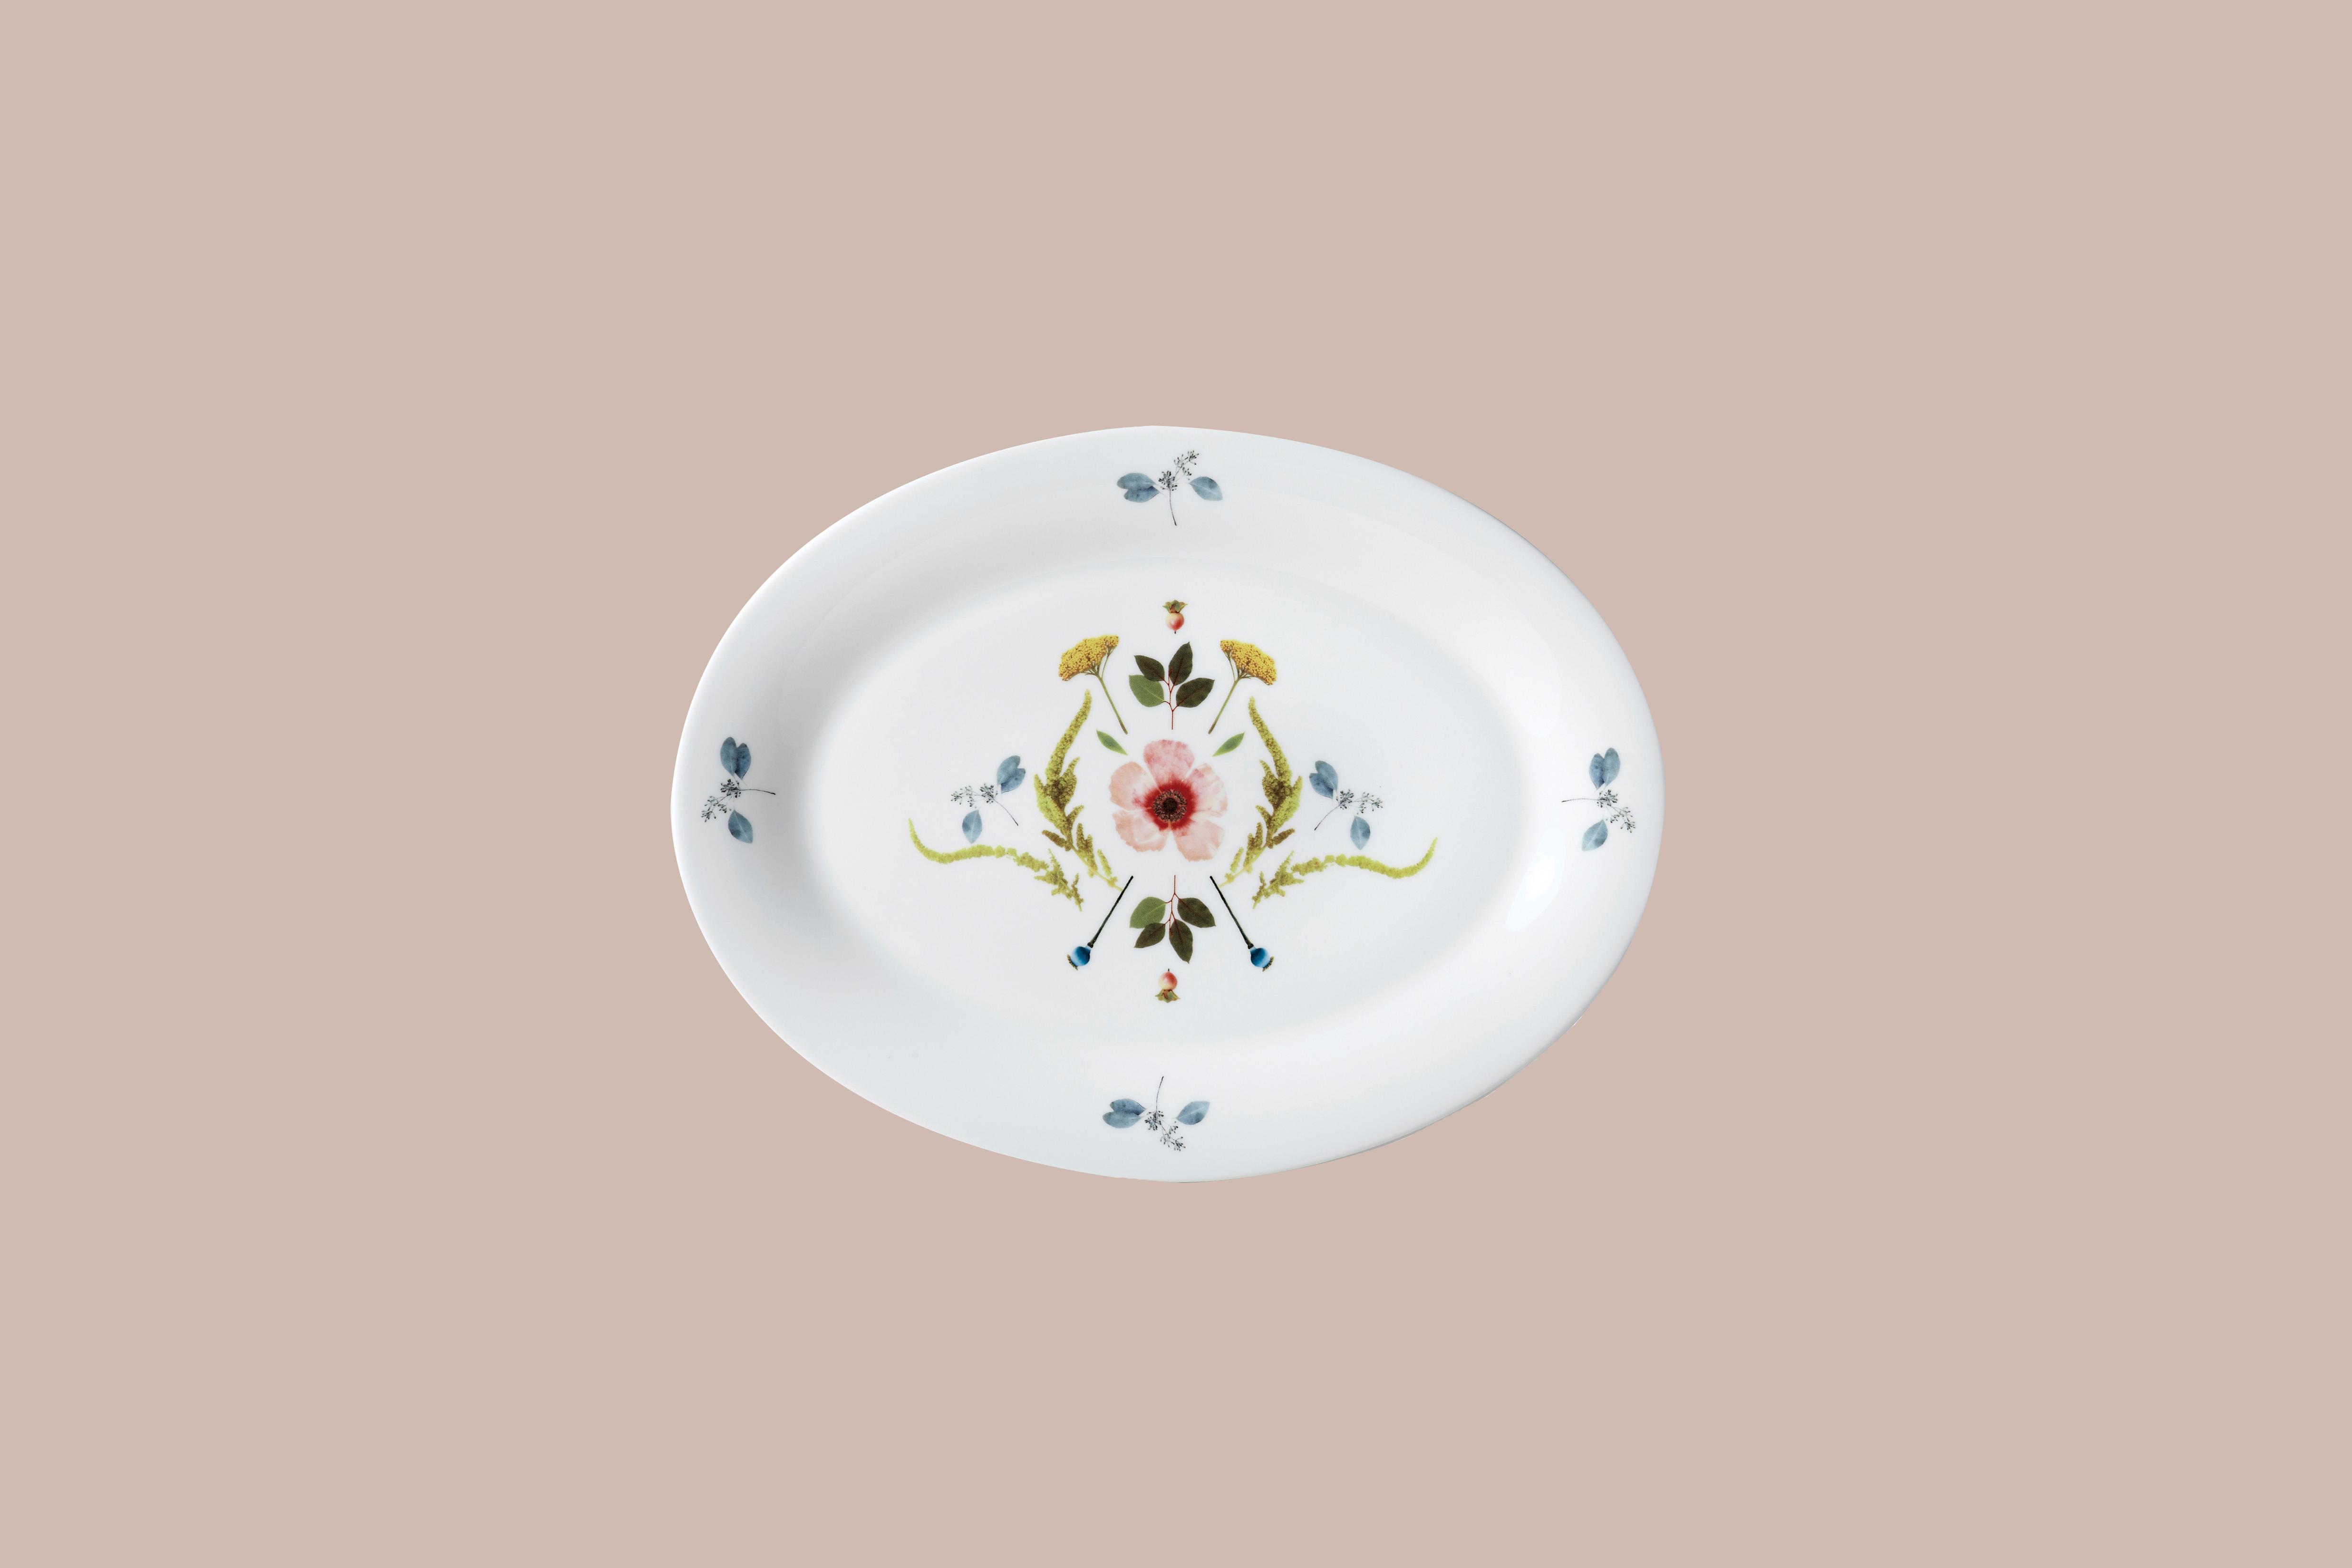 twig ny scandanavian floral platter